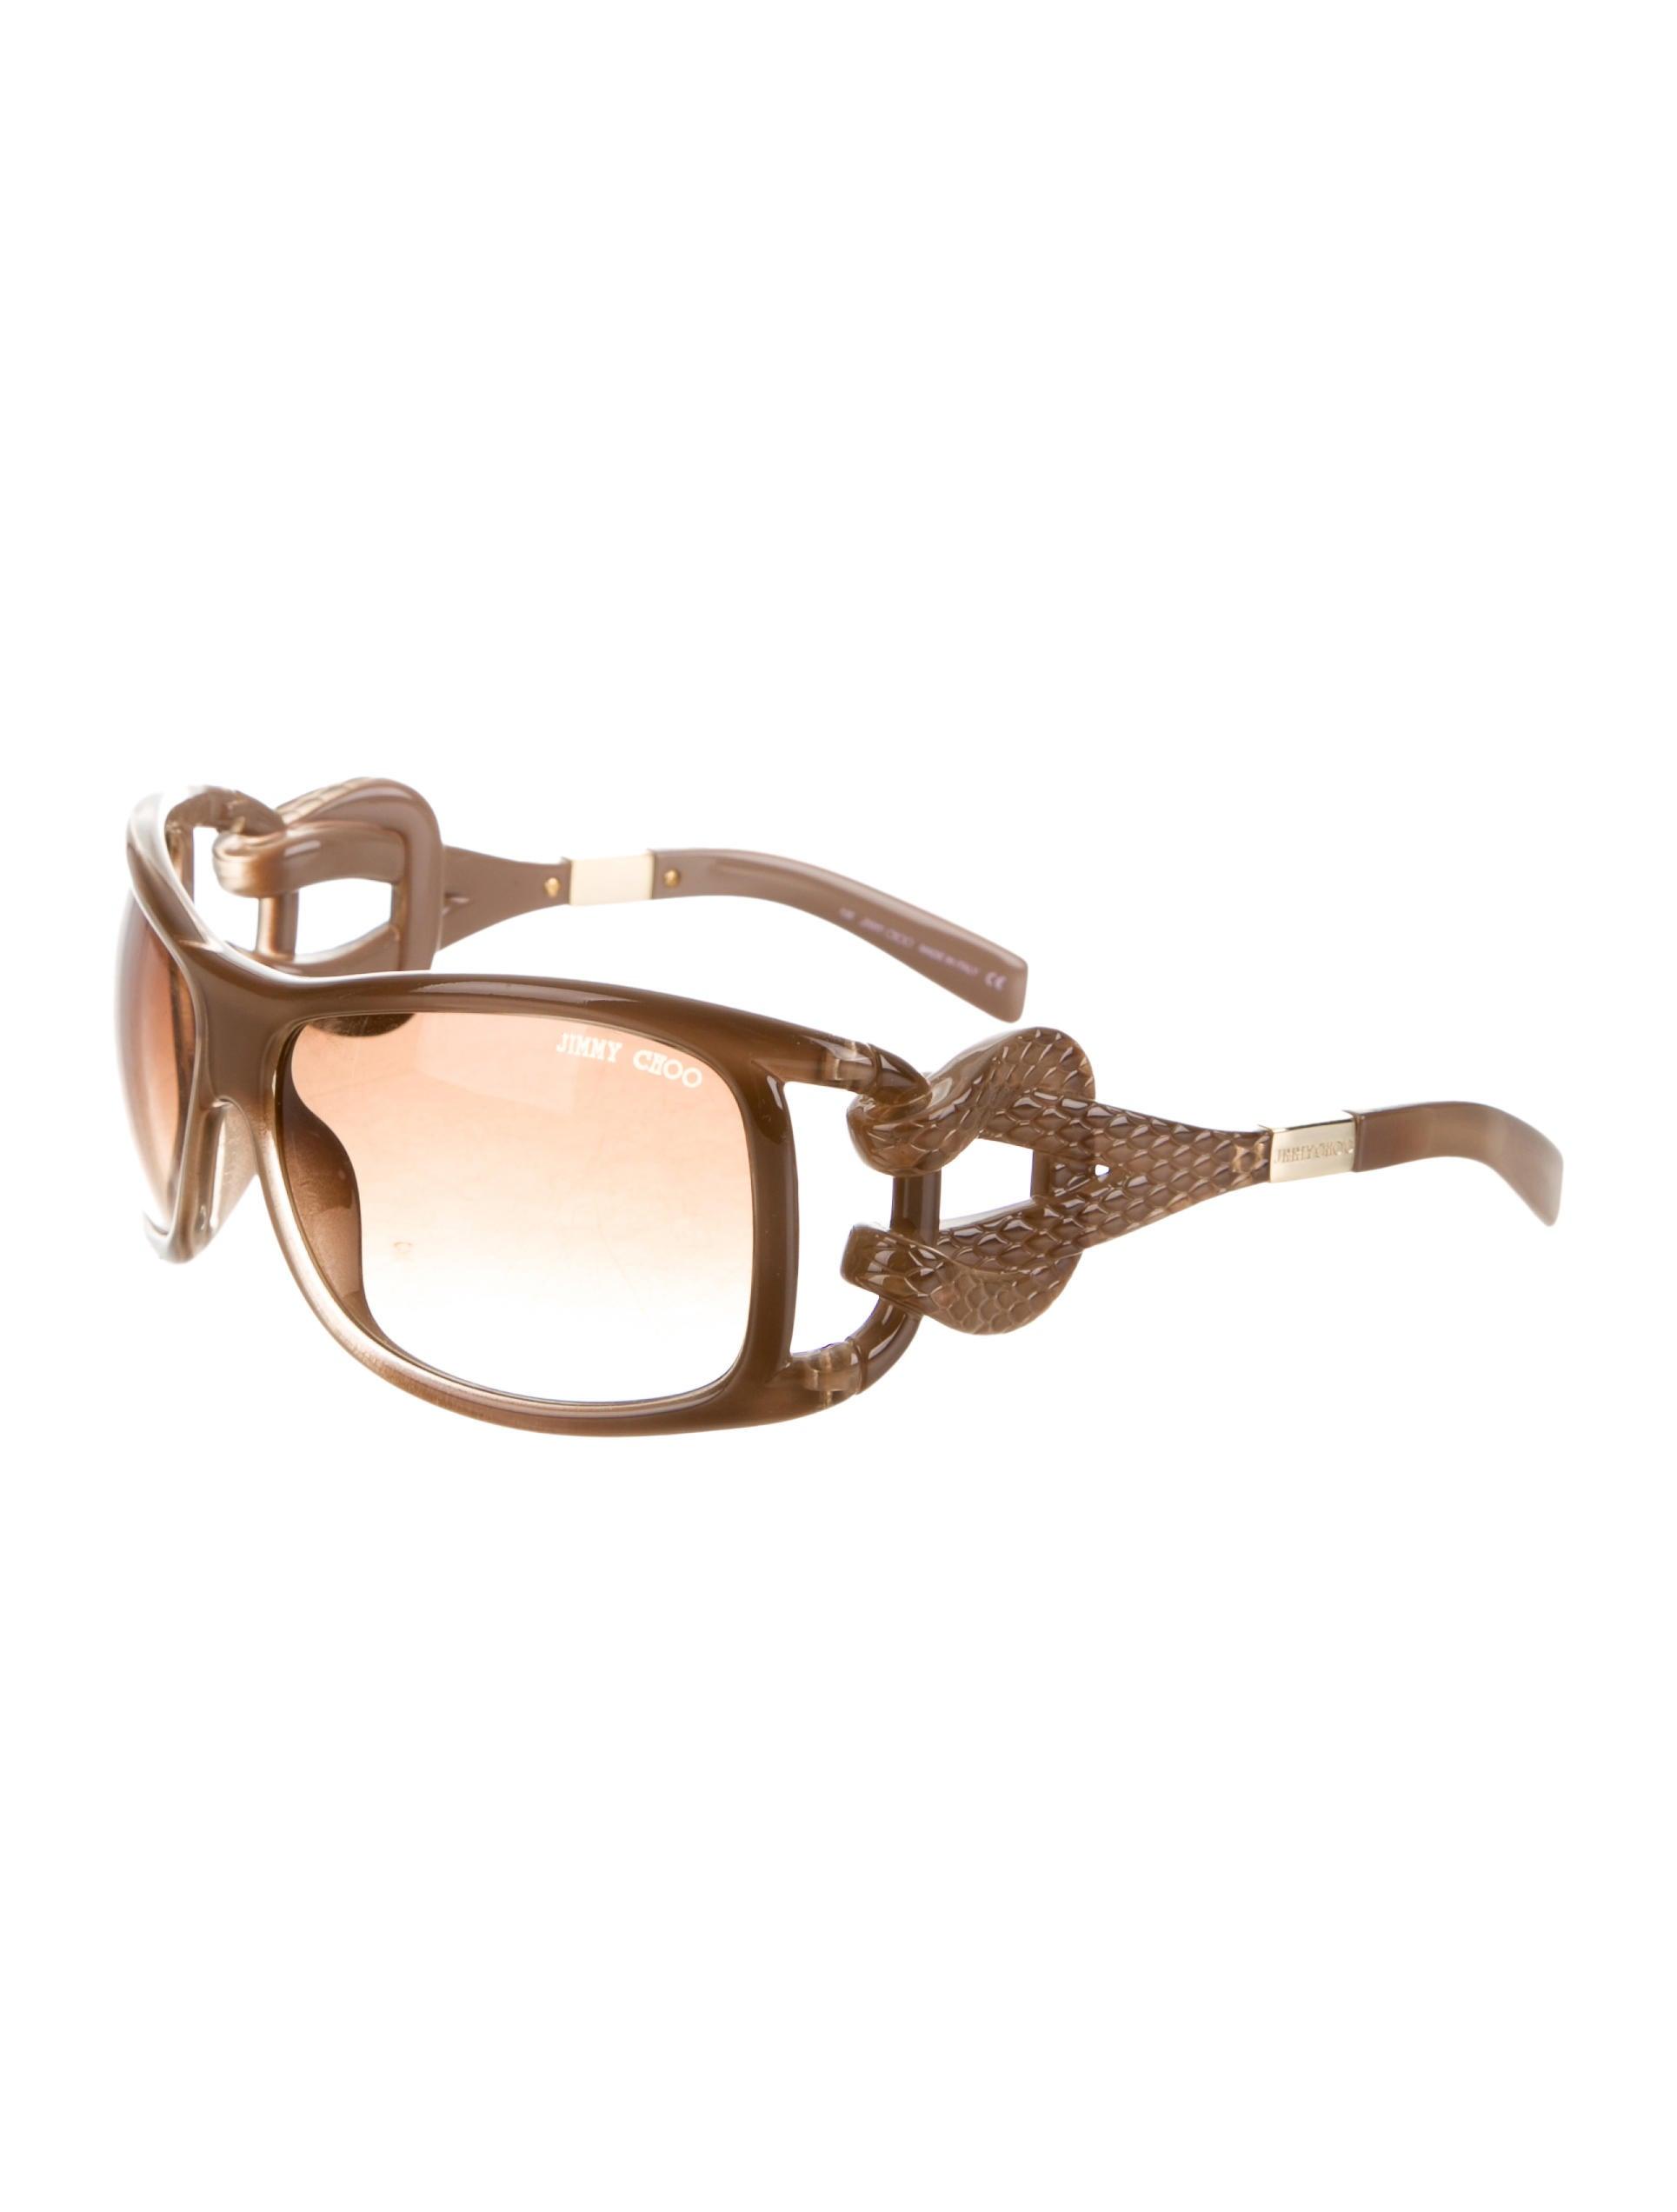 Jimmy Choo Taupe Oversize Sunglasses